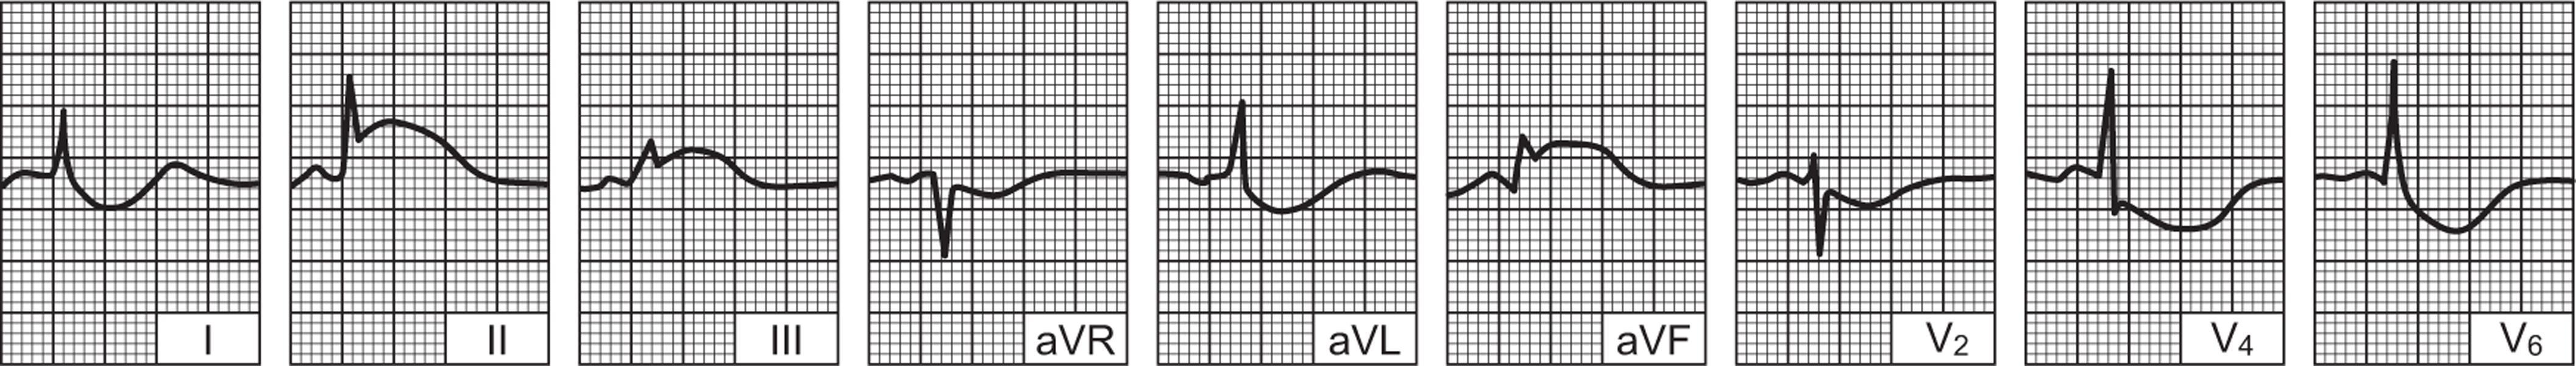 Akutni infarkt miokarda